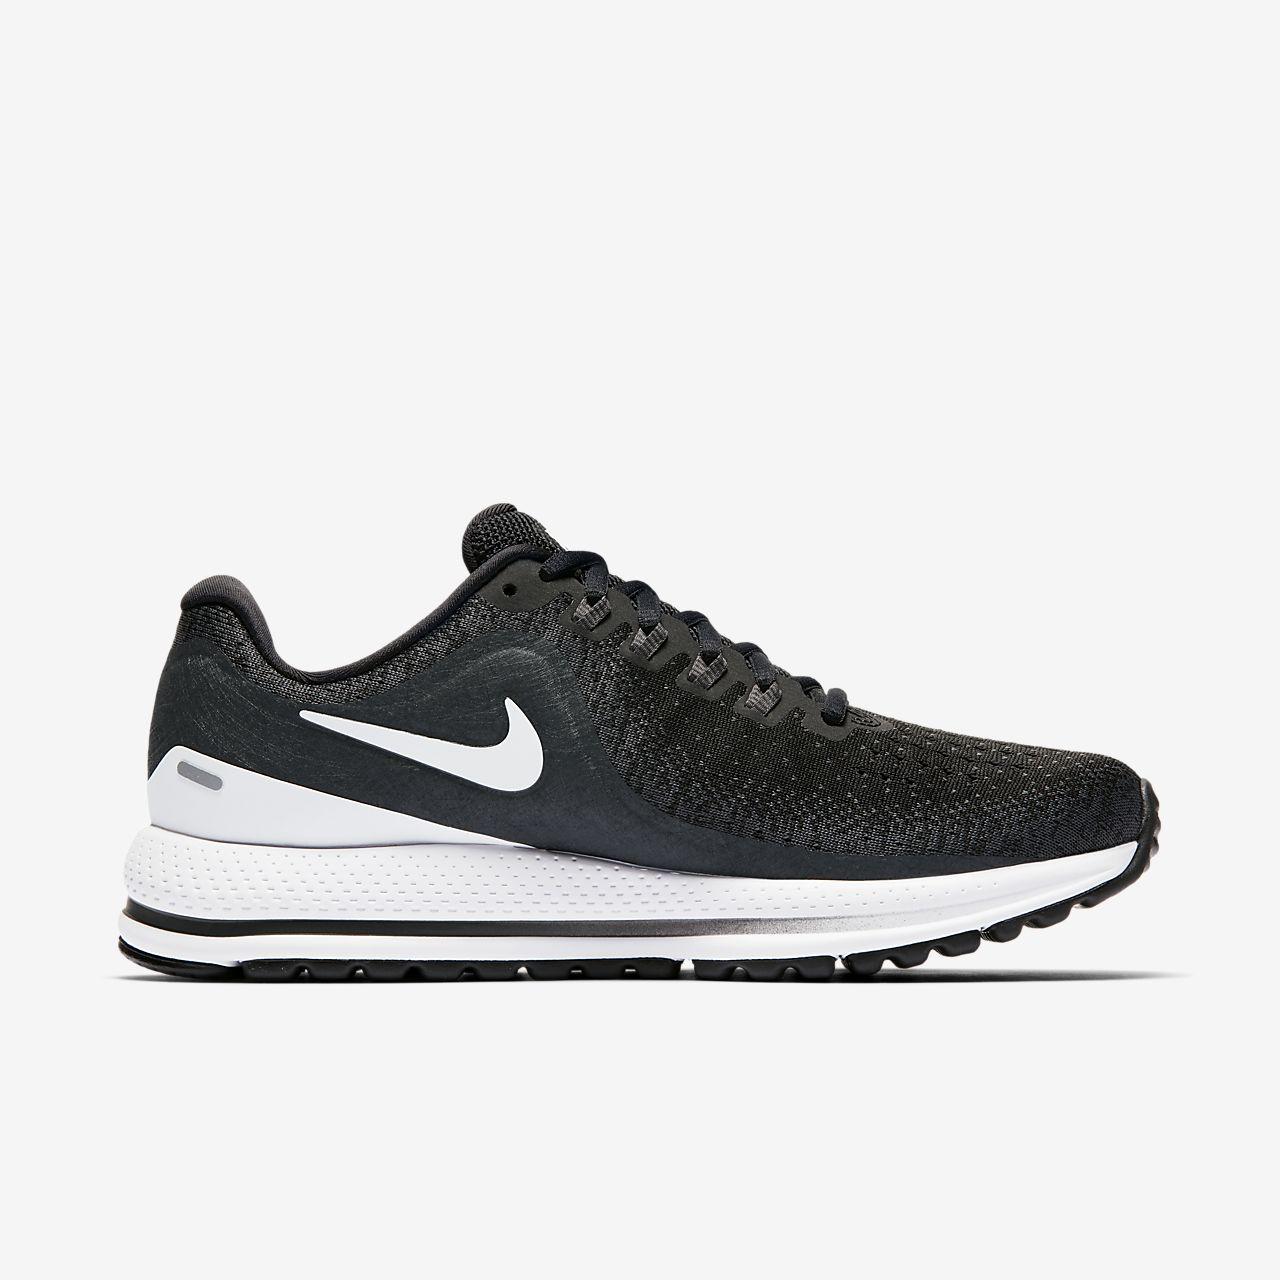 Zoom Women's ShoeCh 13 Running Nike Air Vomero cFTl3K1J